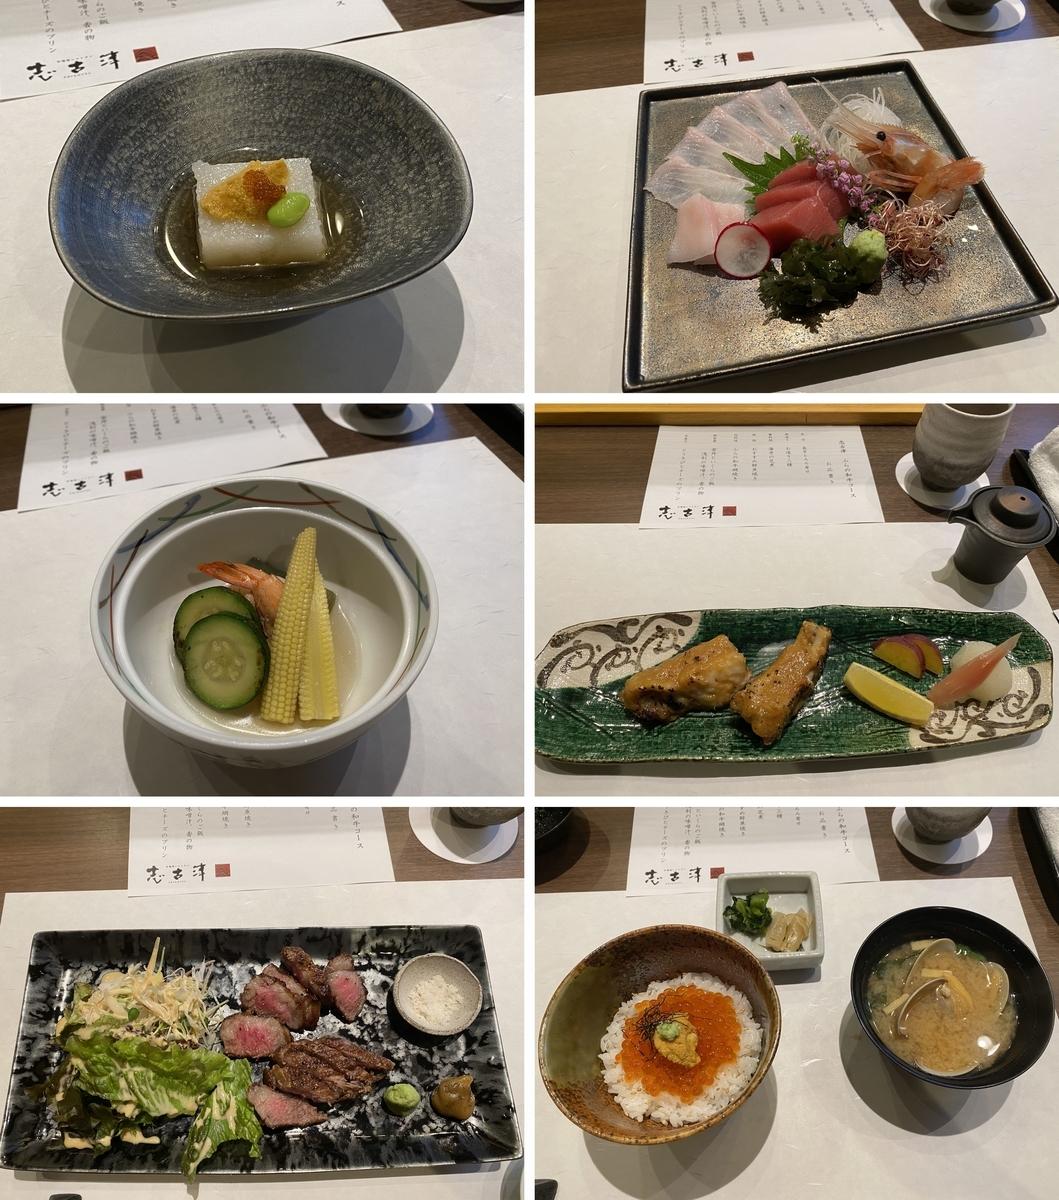 f:id:Nagoya1976:20200831190014j:plain